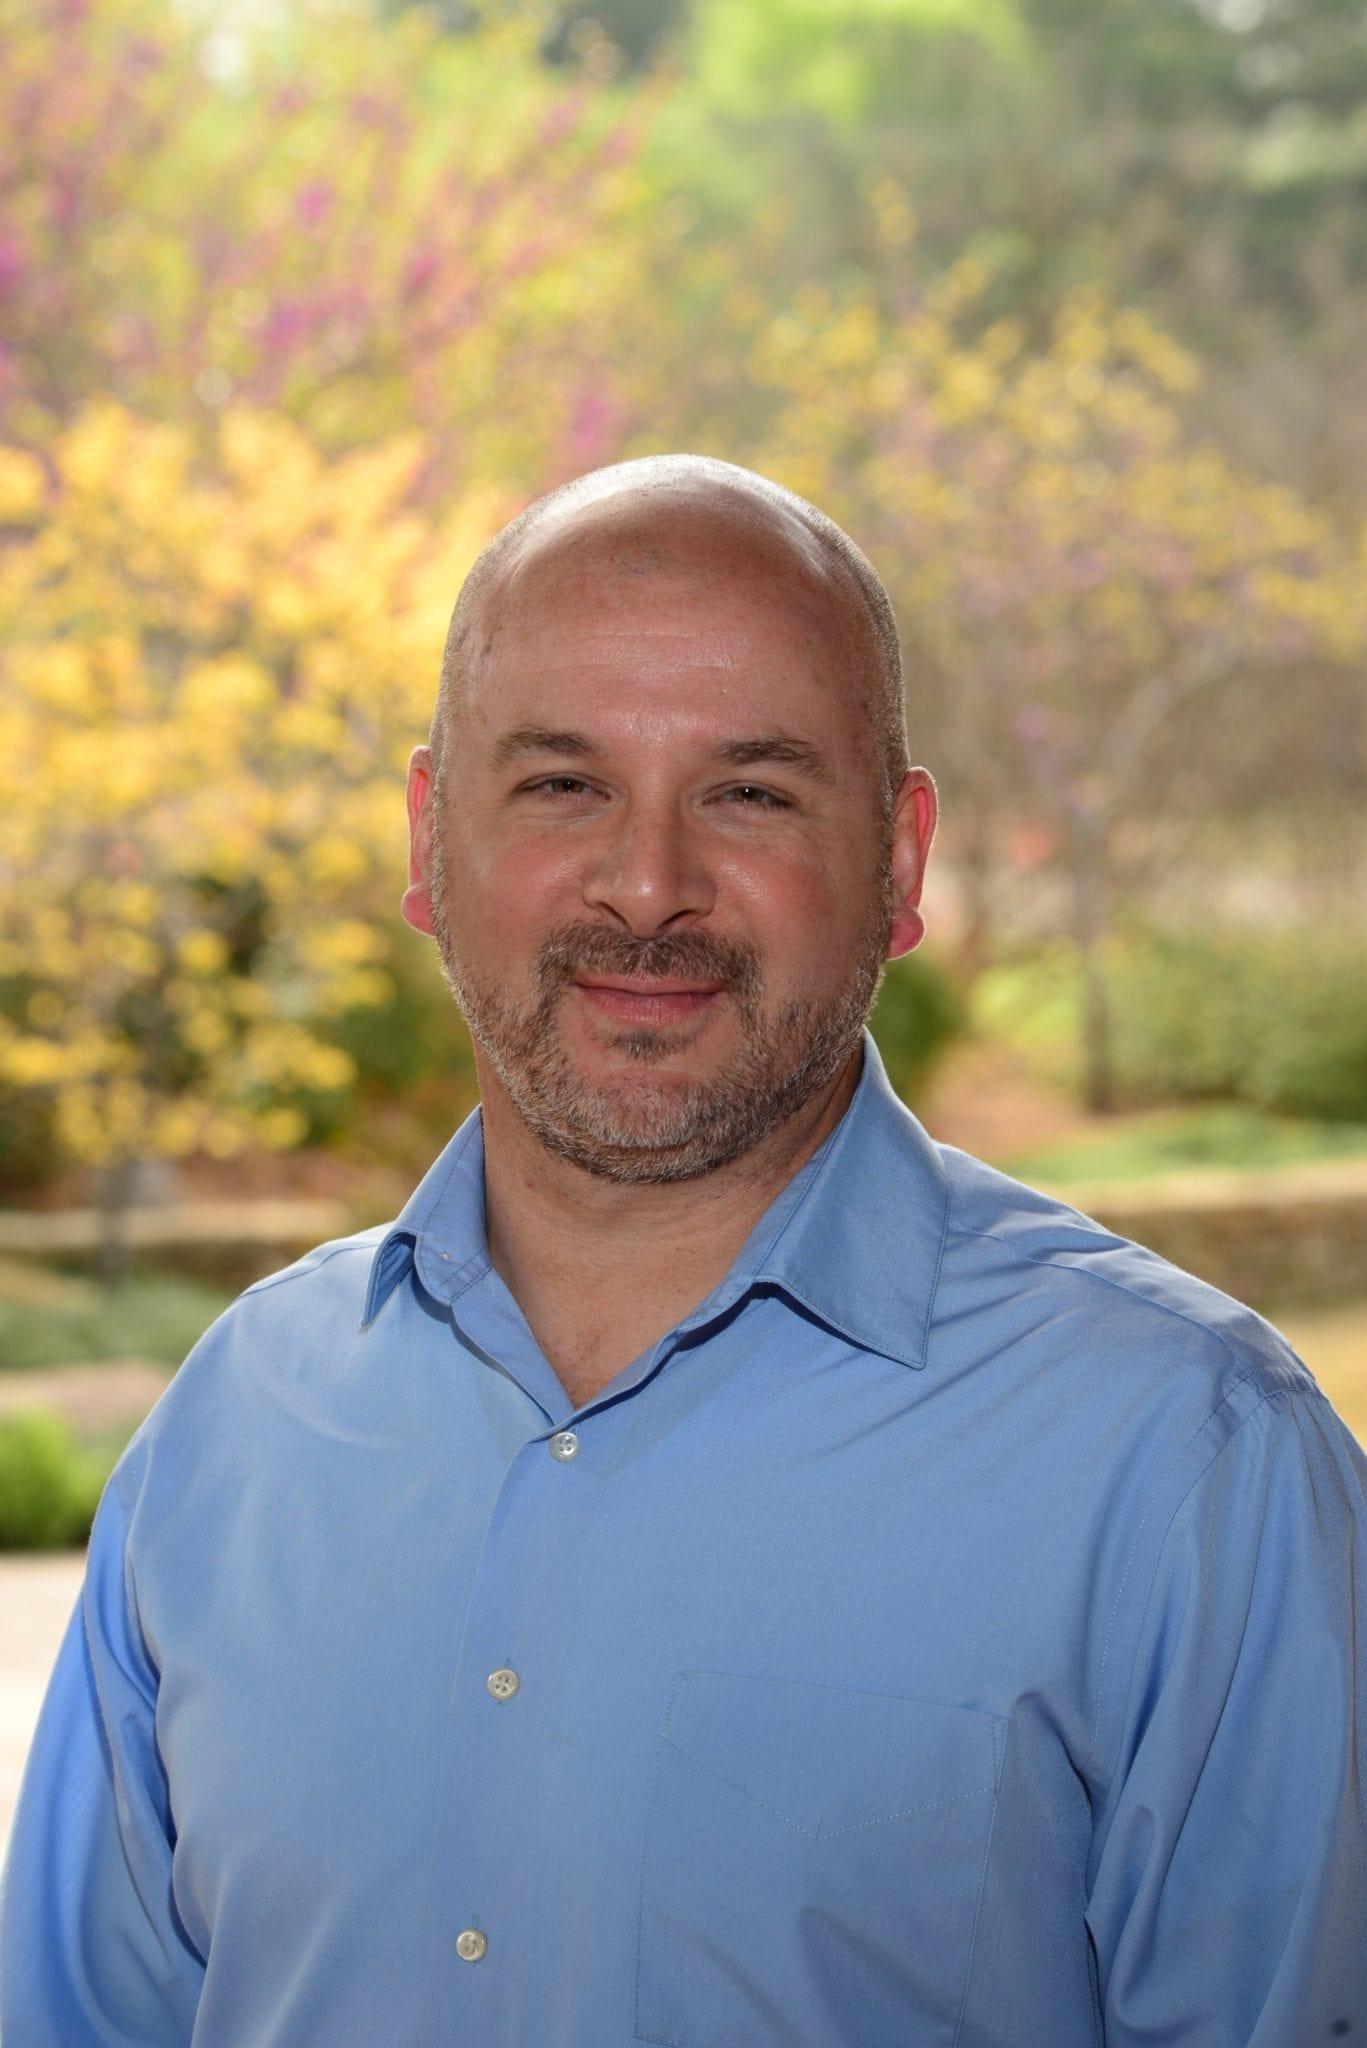 Rodney Skyles, Director of Operations